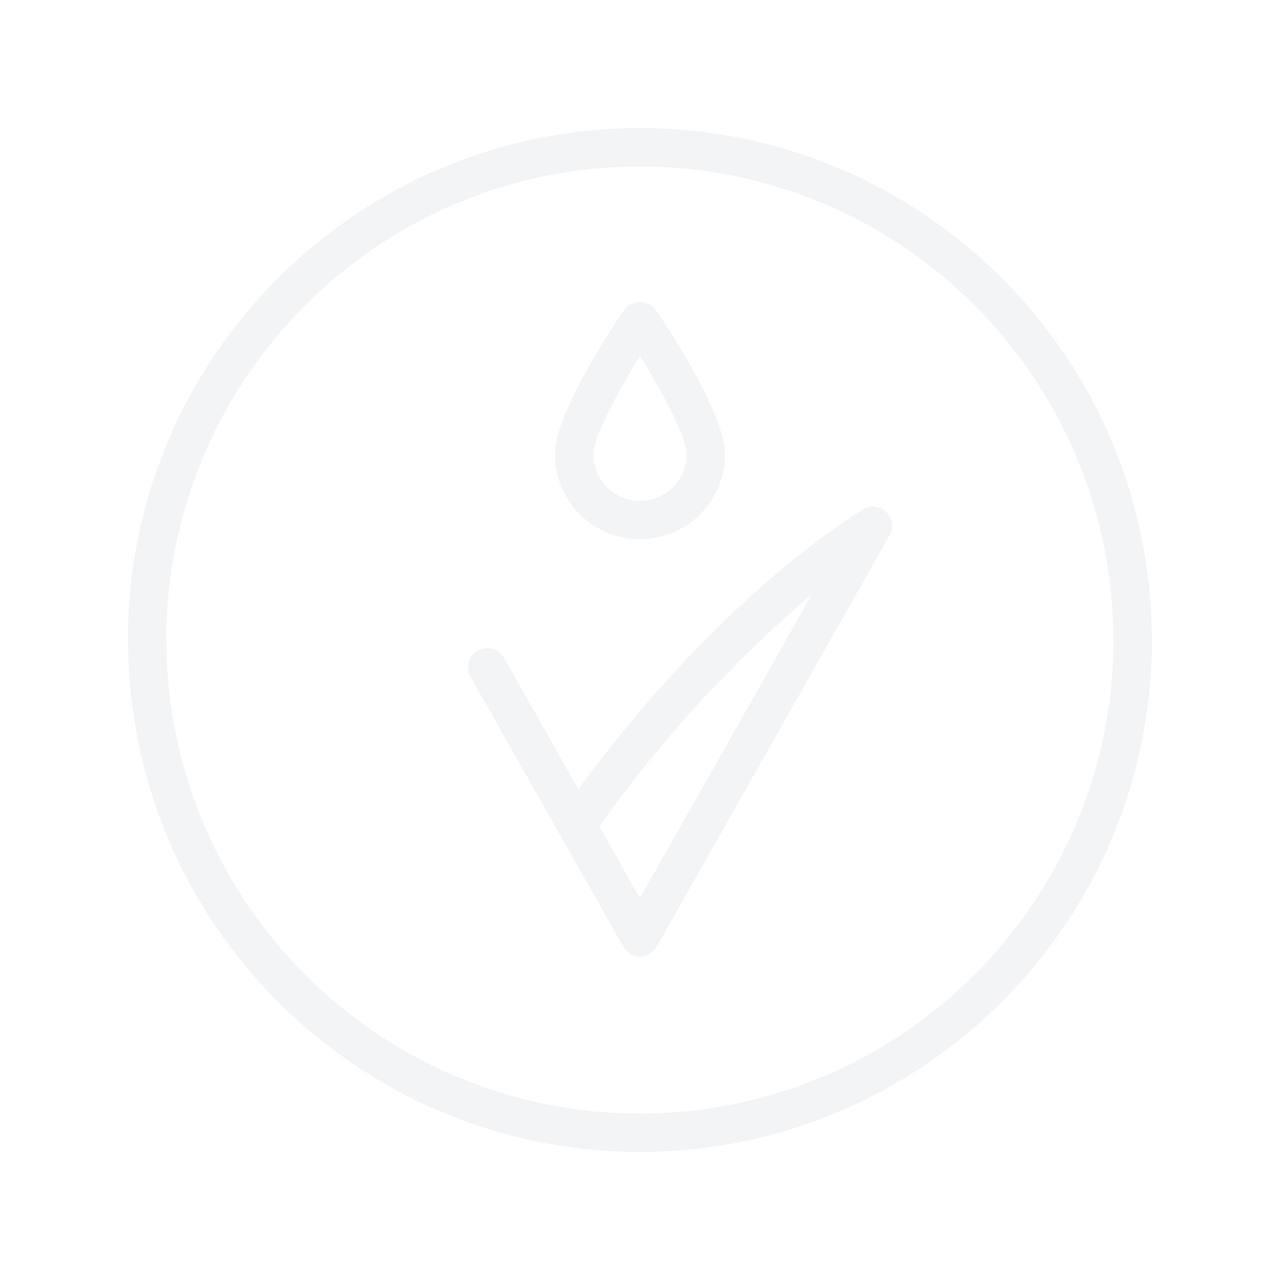 LUMENE Instant Glow Fresh Skin Tint Universal Light 30ml